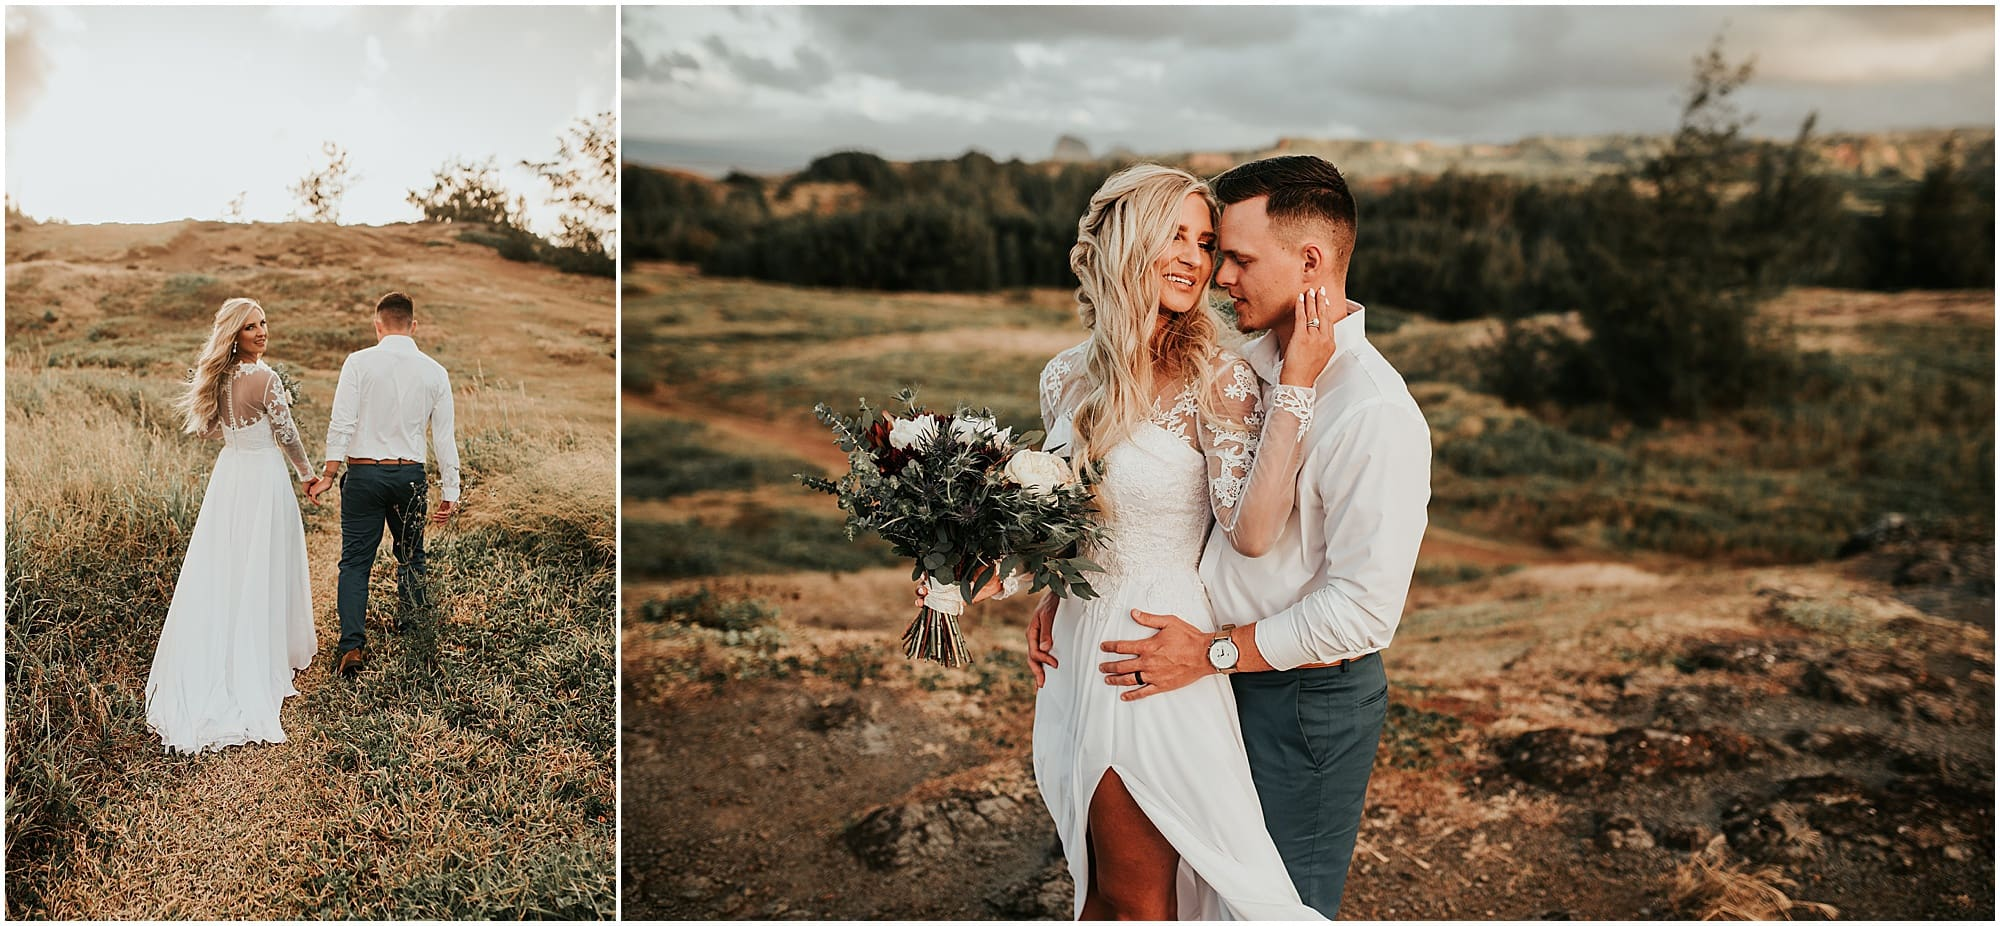 Maui wedding photographer32